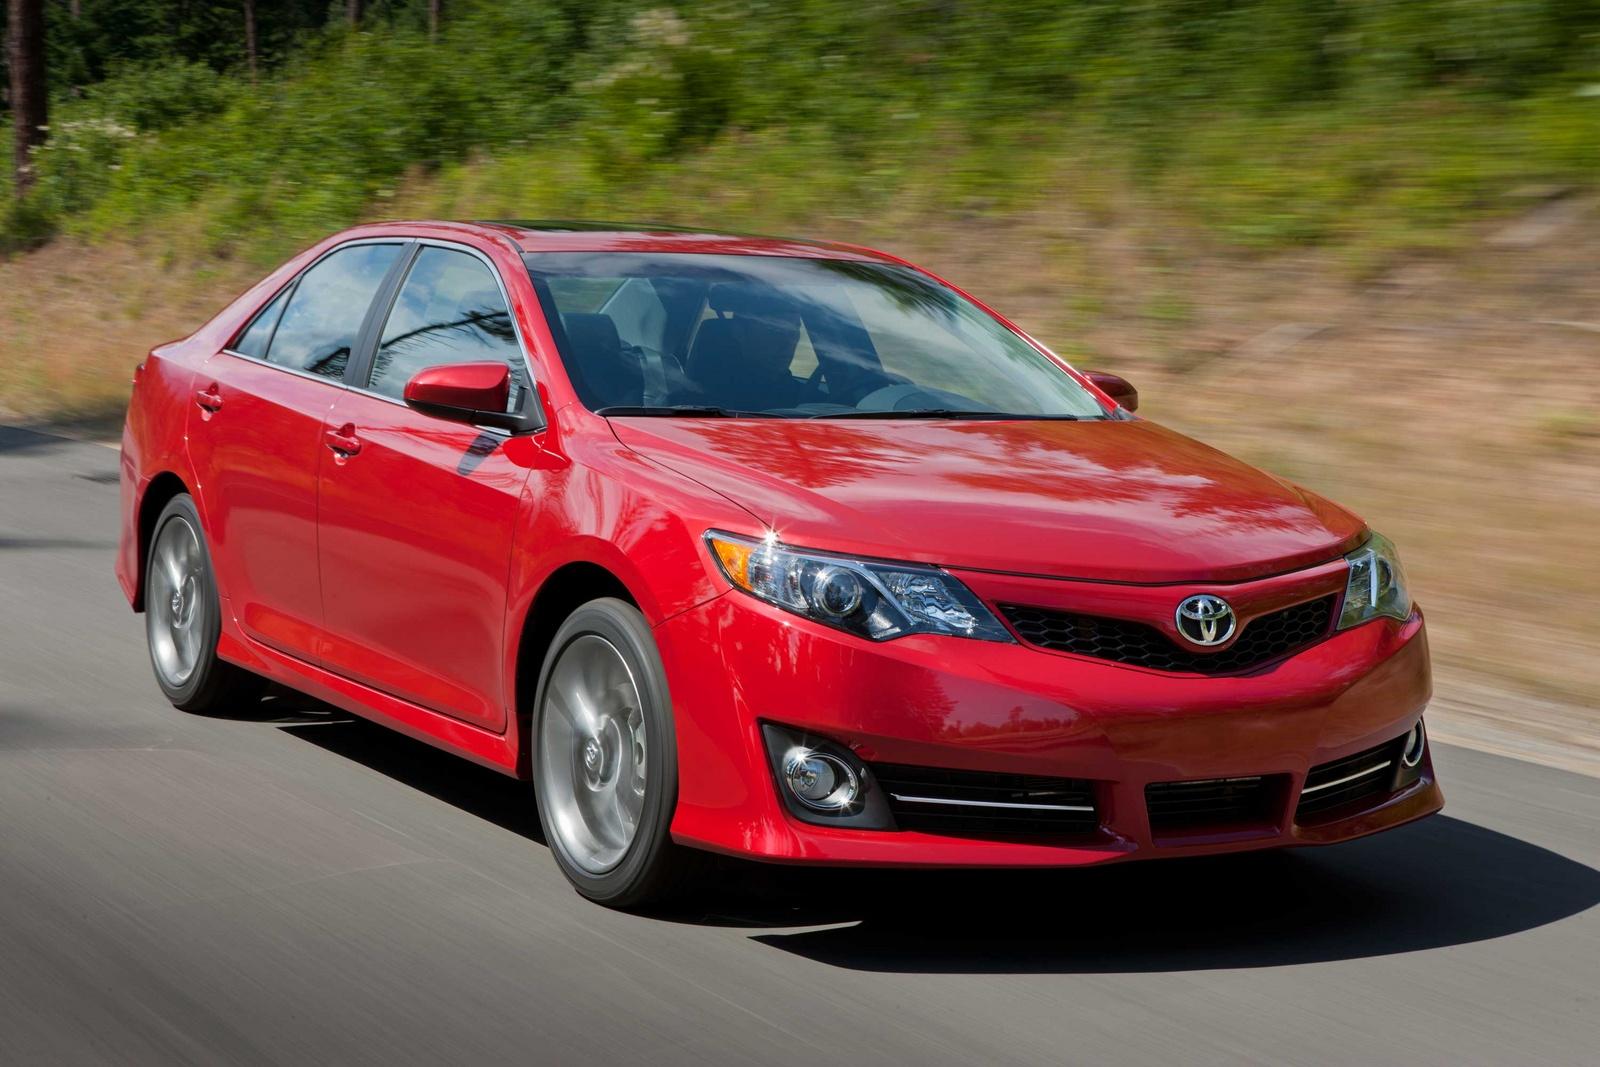 2013 Toyota Camry Pictures Cargurus